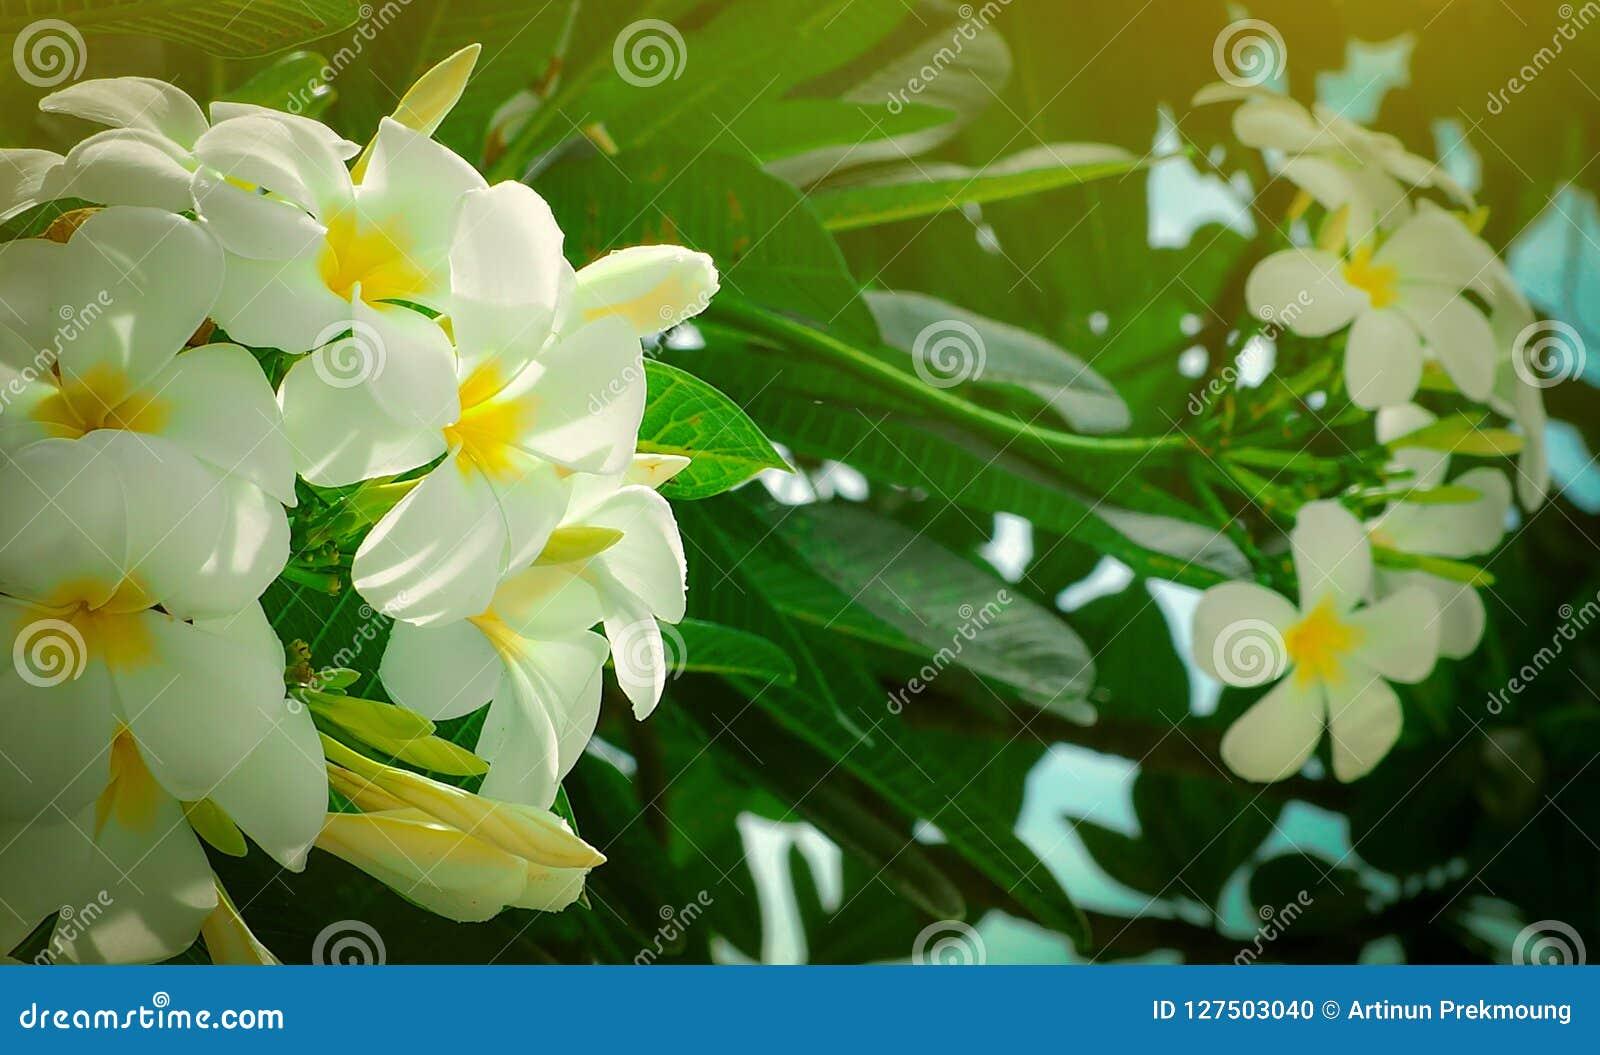 Frangipani Flower Plumeria Alba With Green Leaves On Blurred